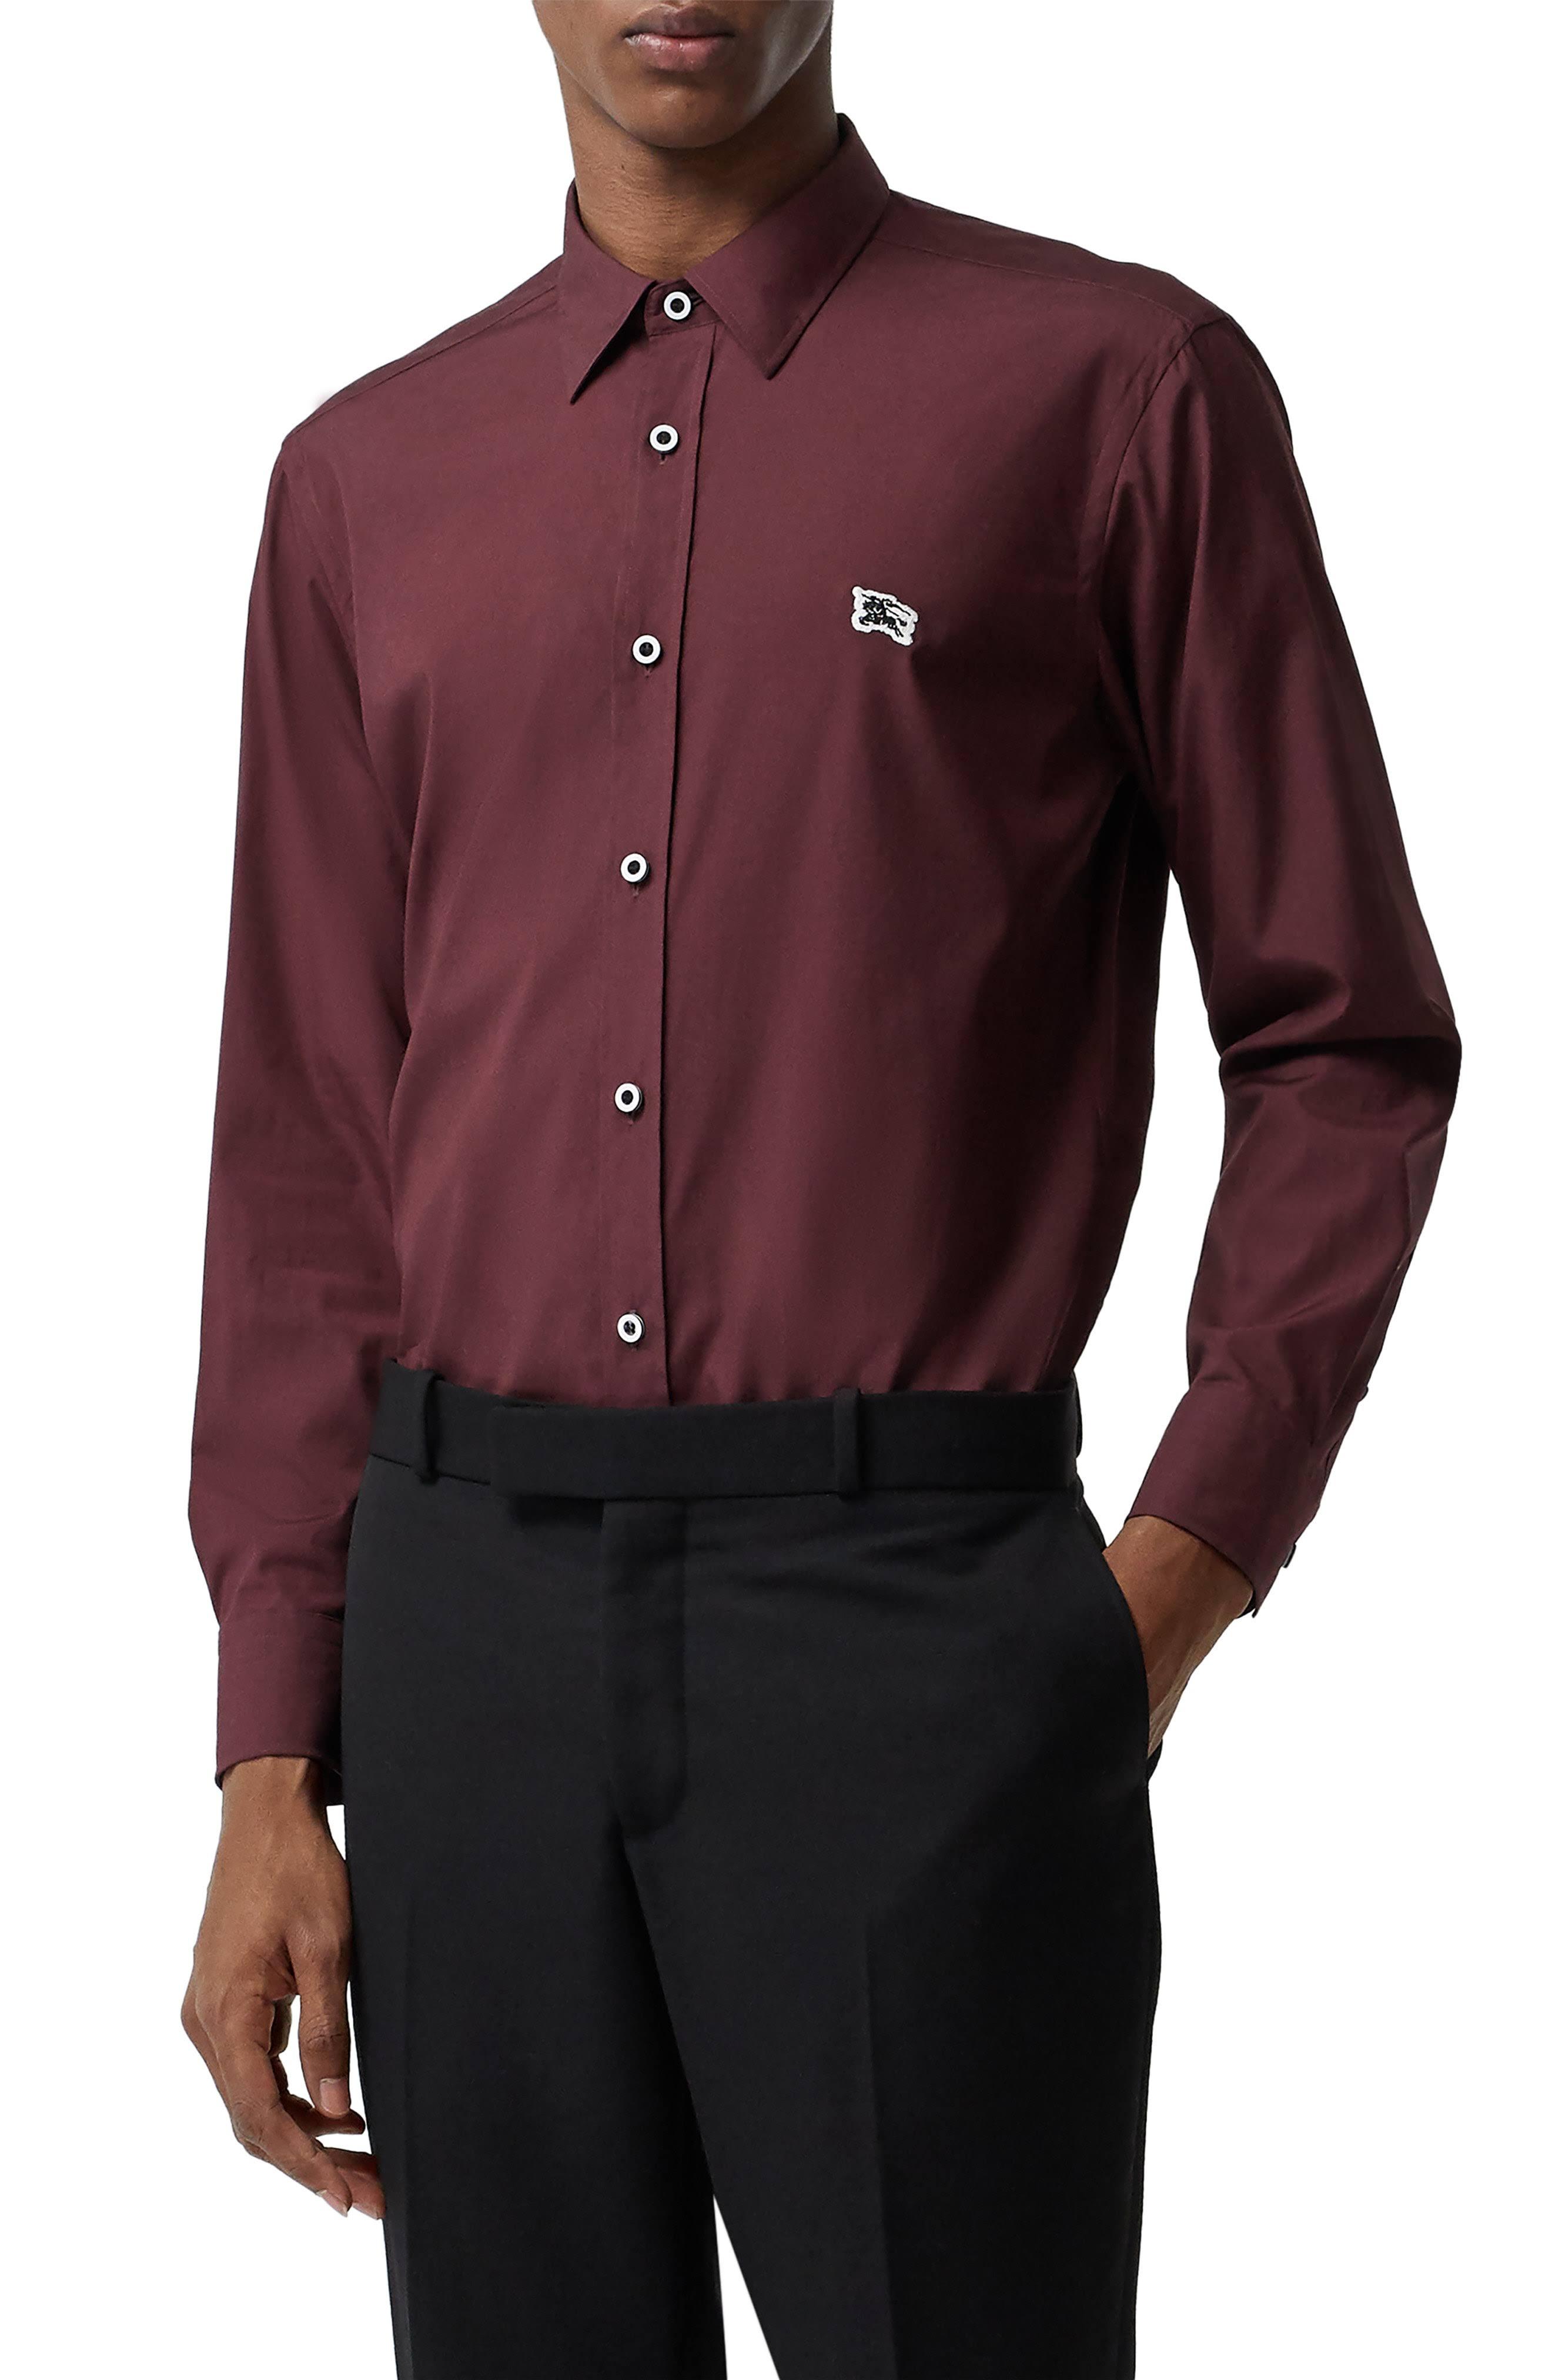 Burberry Rojo Camisa Cuello Hombre L Para Vestir Alto De William qO8gOXRx